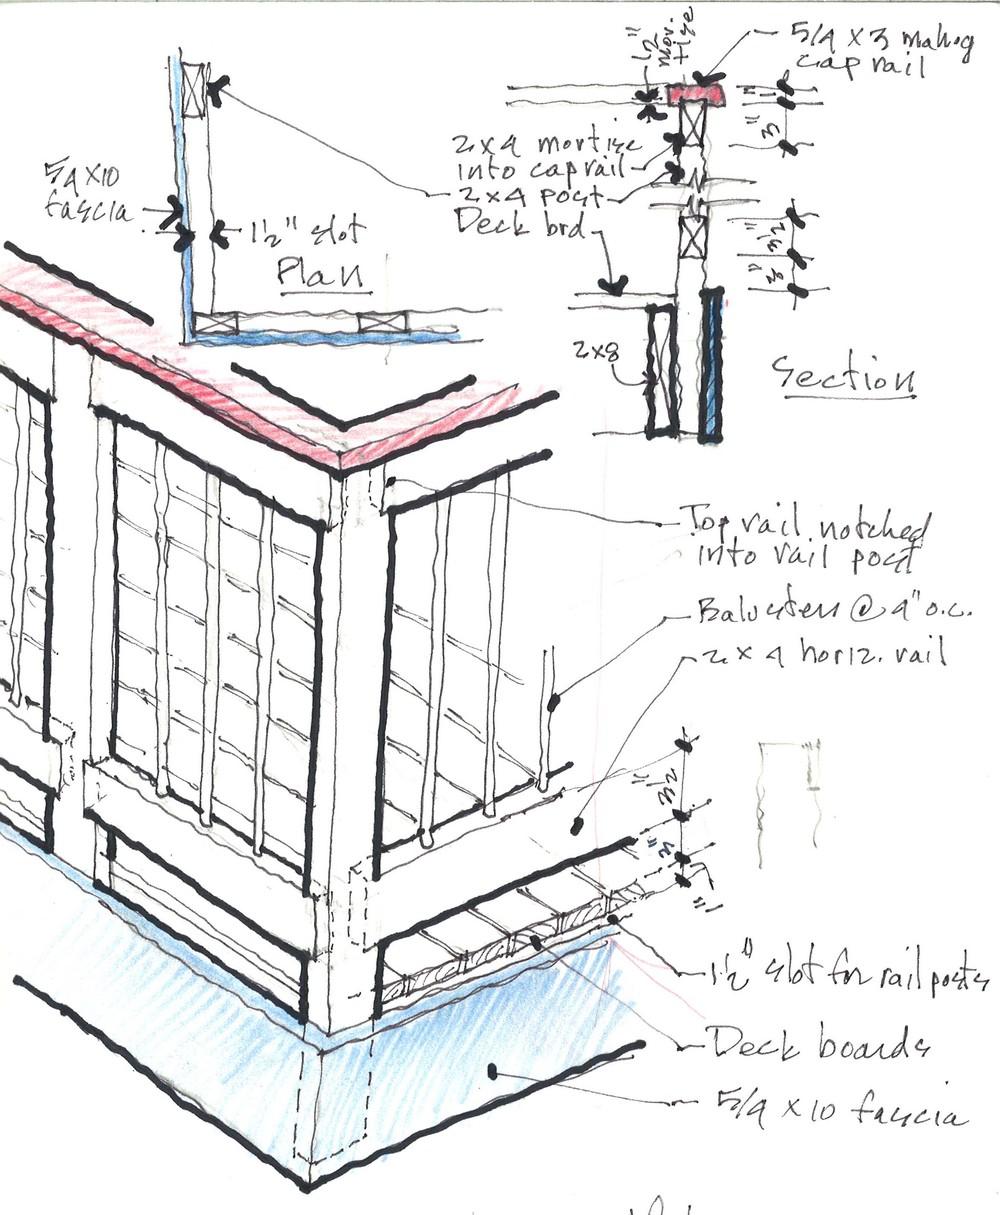 Simple railing design with stock aluminum balusters, 2x4 cedar vertical and horizontal members